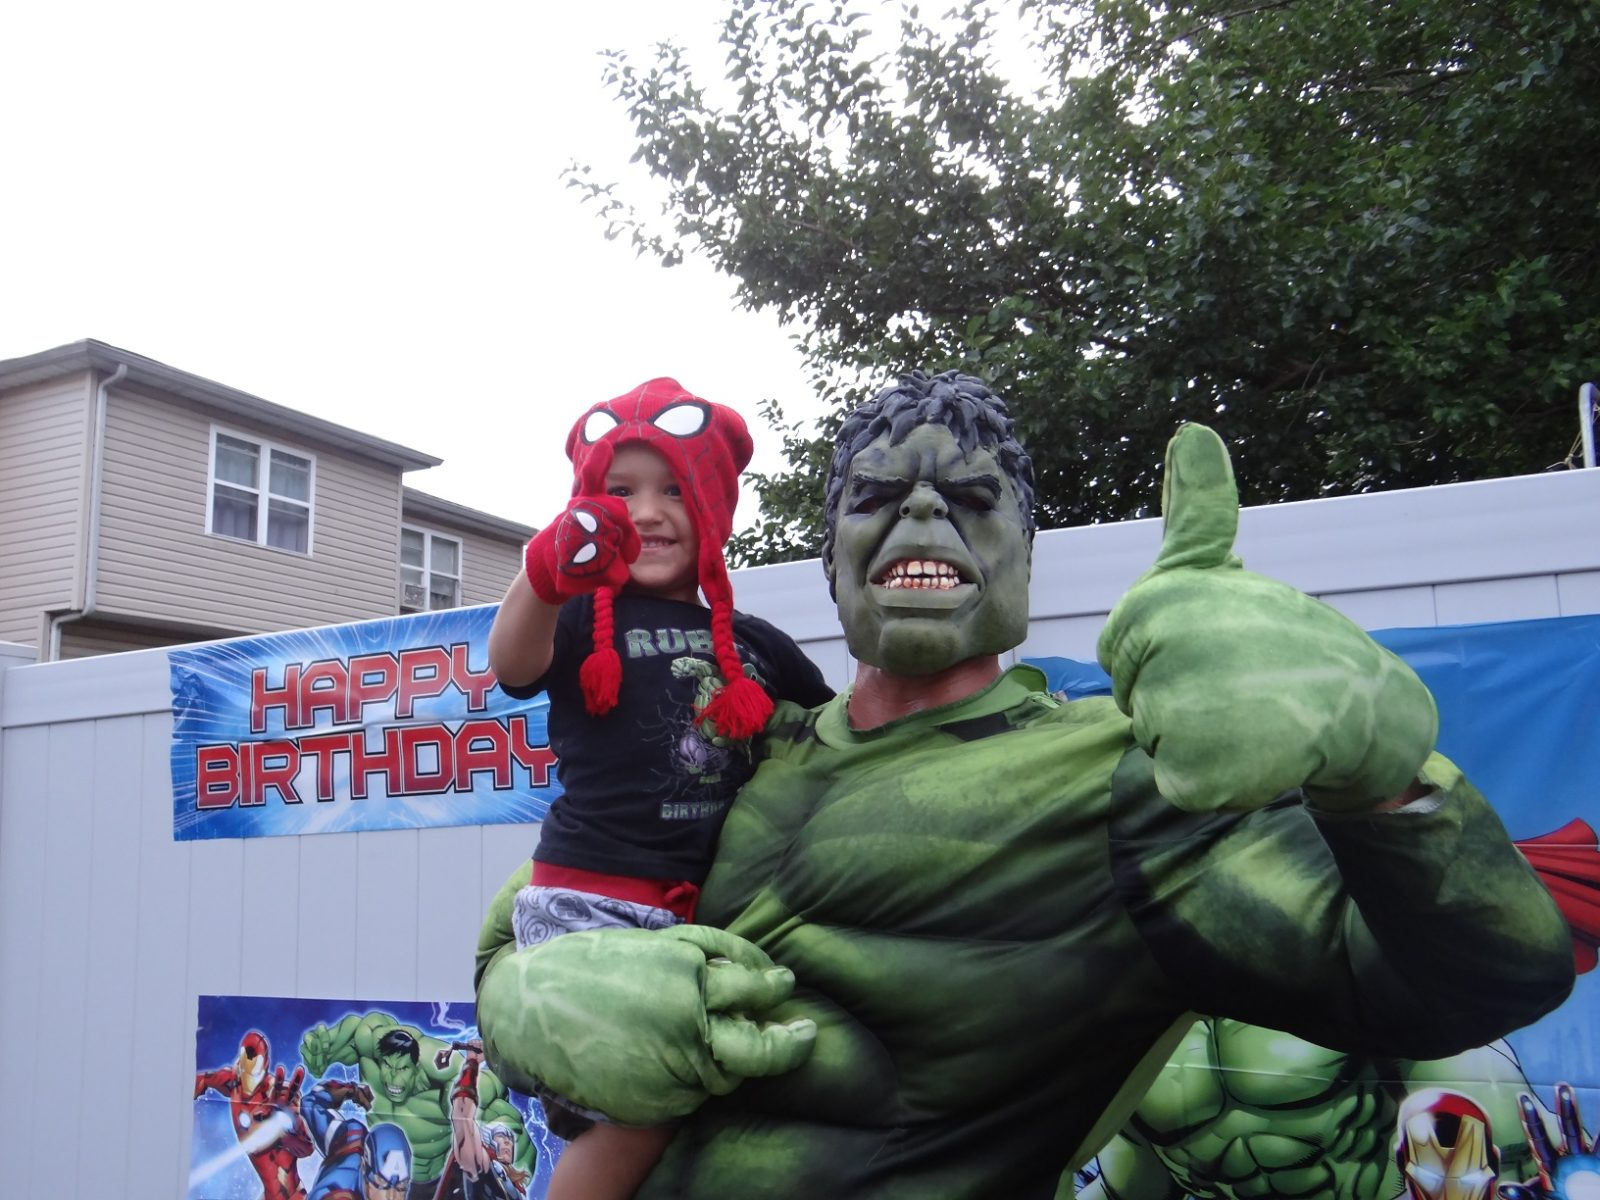 Incredable Hulk Birthday party